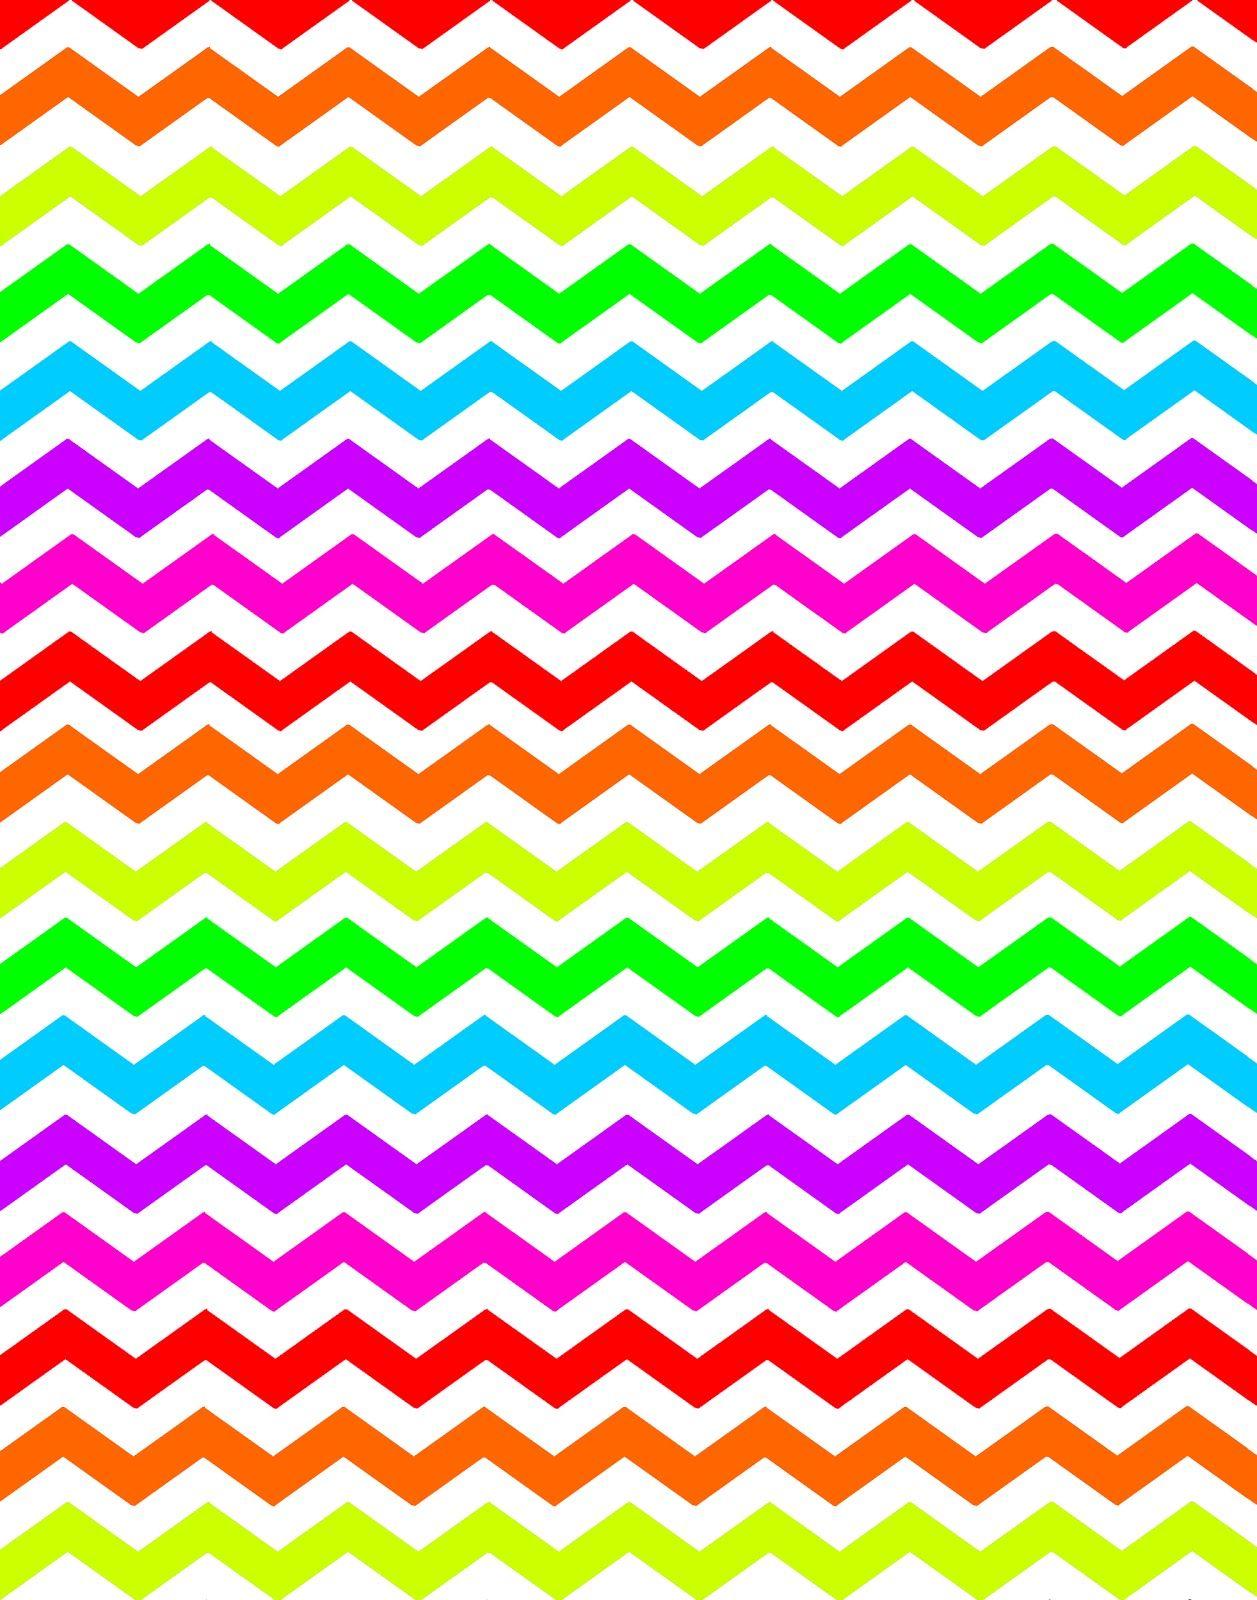 Neon Colors Wallpaper.